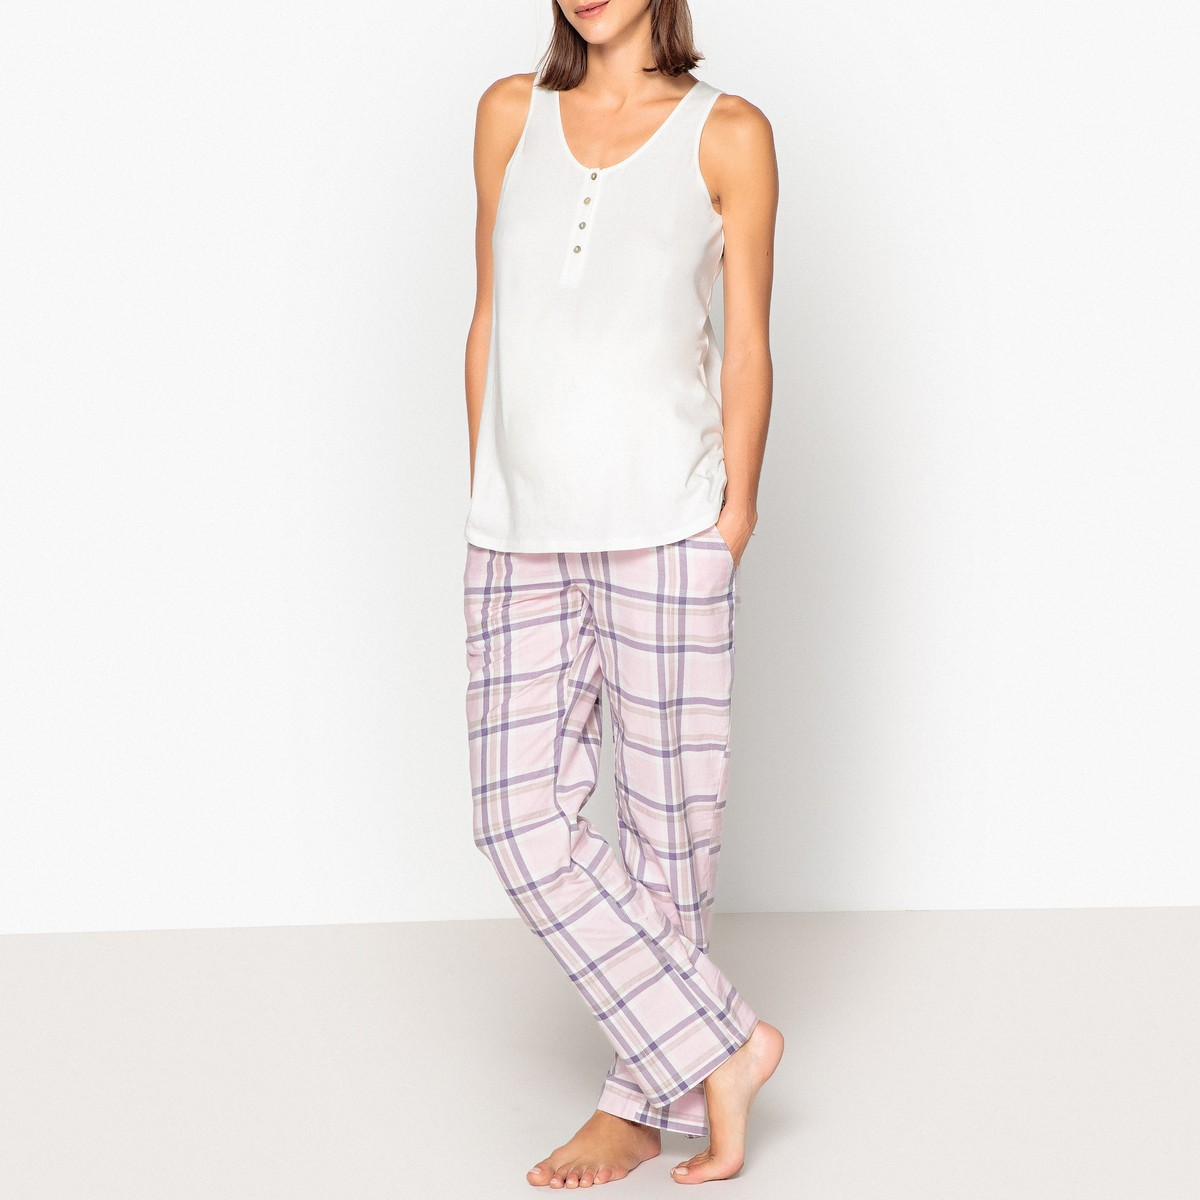 507054a6746 SizePlusOnly | Γυναικεία Ρούχα Μεγάλα Μεγέθη | La Redoute | esorouxa ...